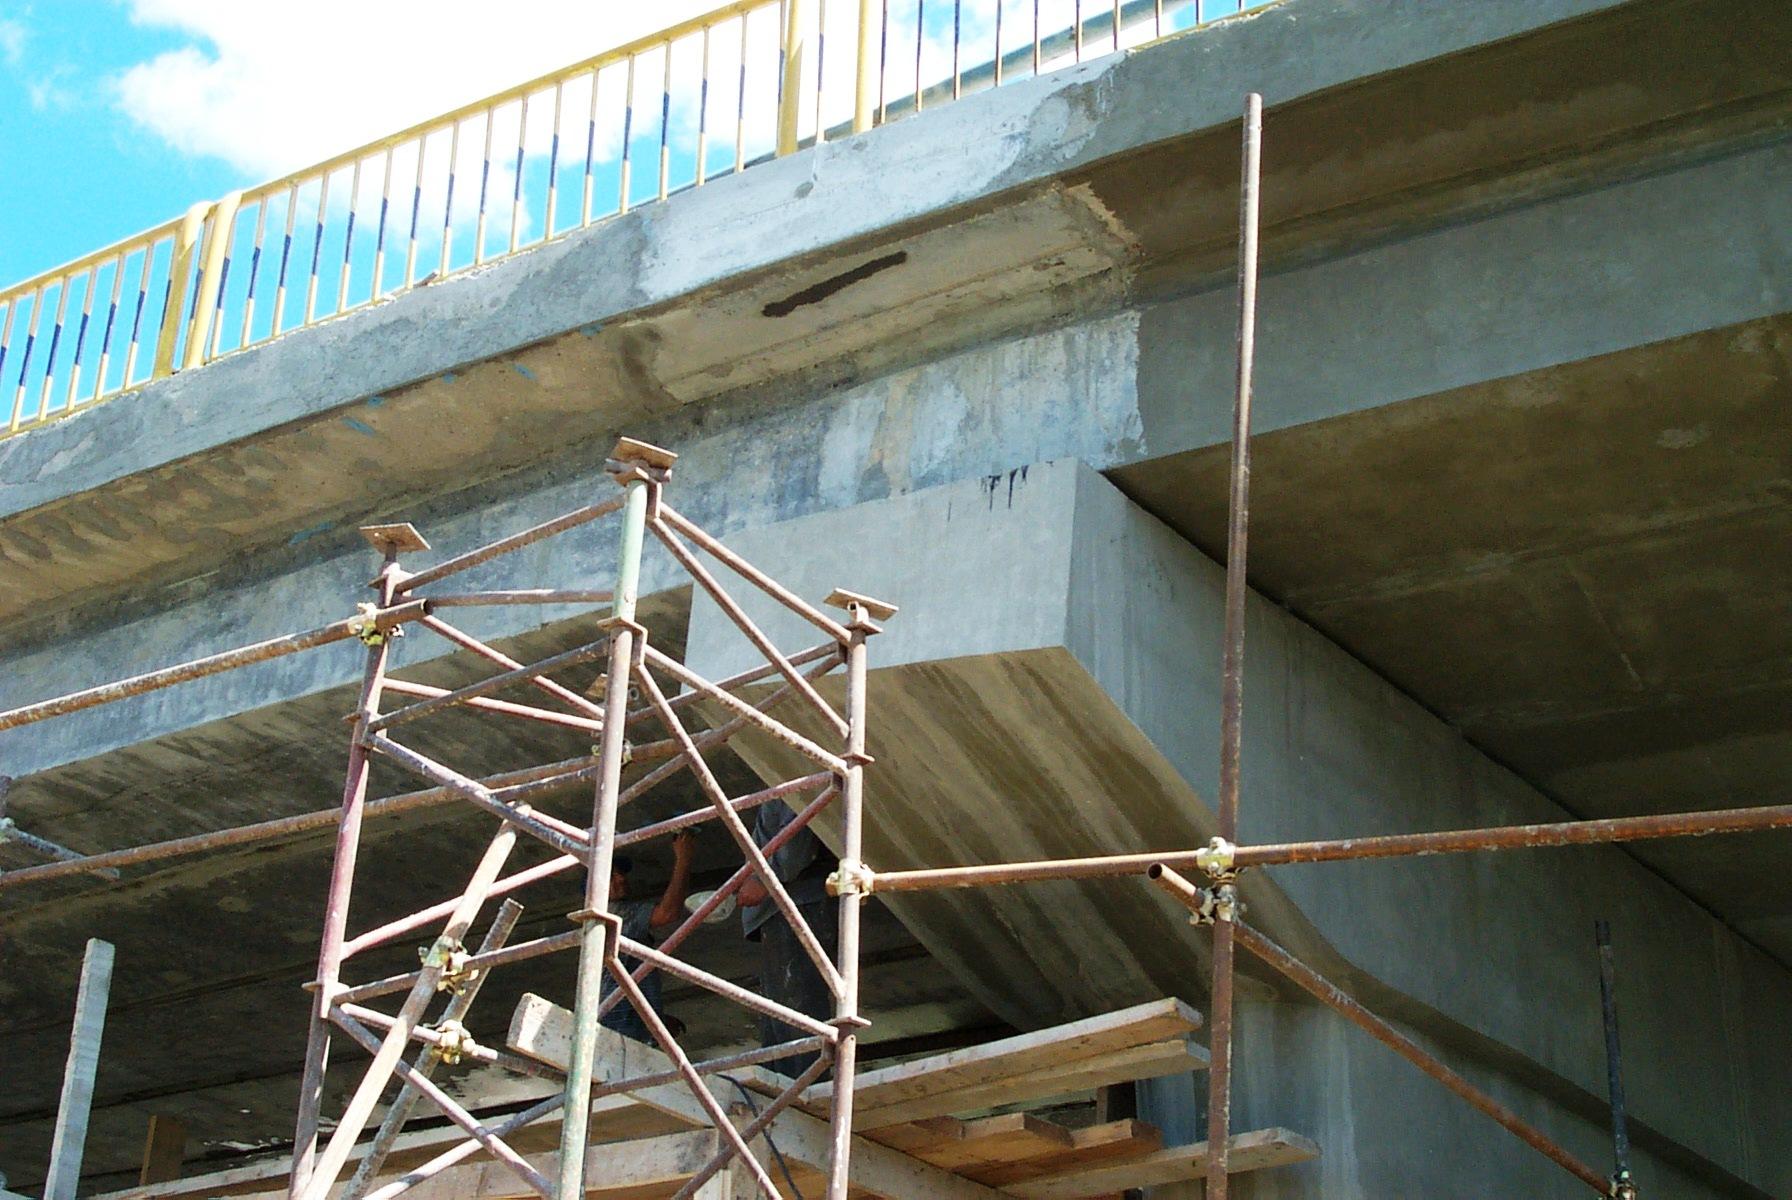 Reparatii pod (DN2), Km. 33 - 028, peste raul Calnistea MAPEI - Poza 10